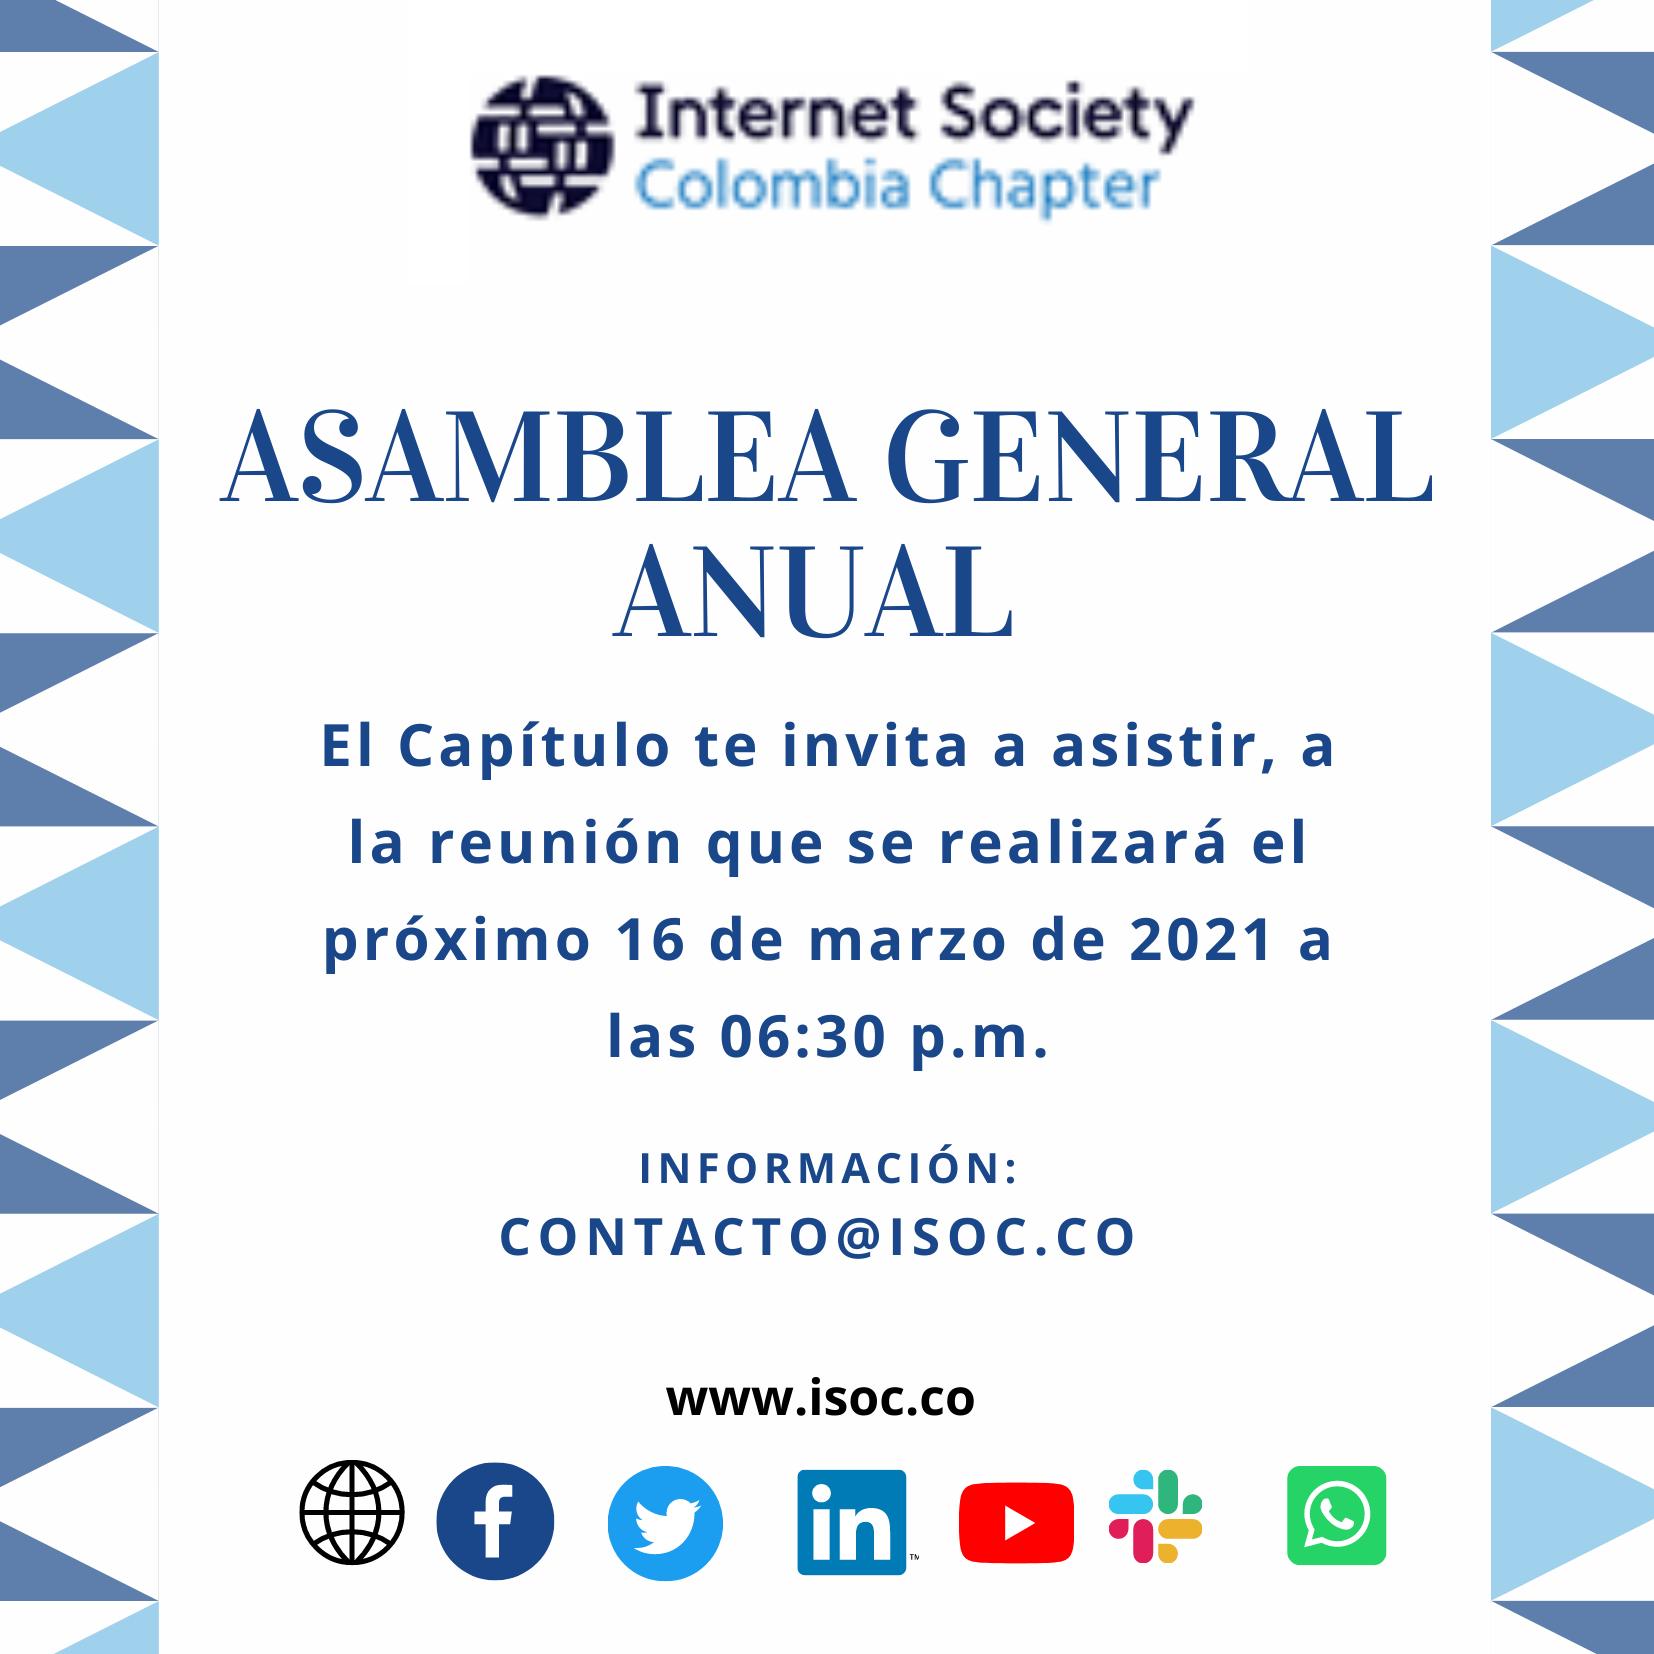 Imagen alusiva a Asamblea General (2021) de Internet Society Colombia Chapter.